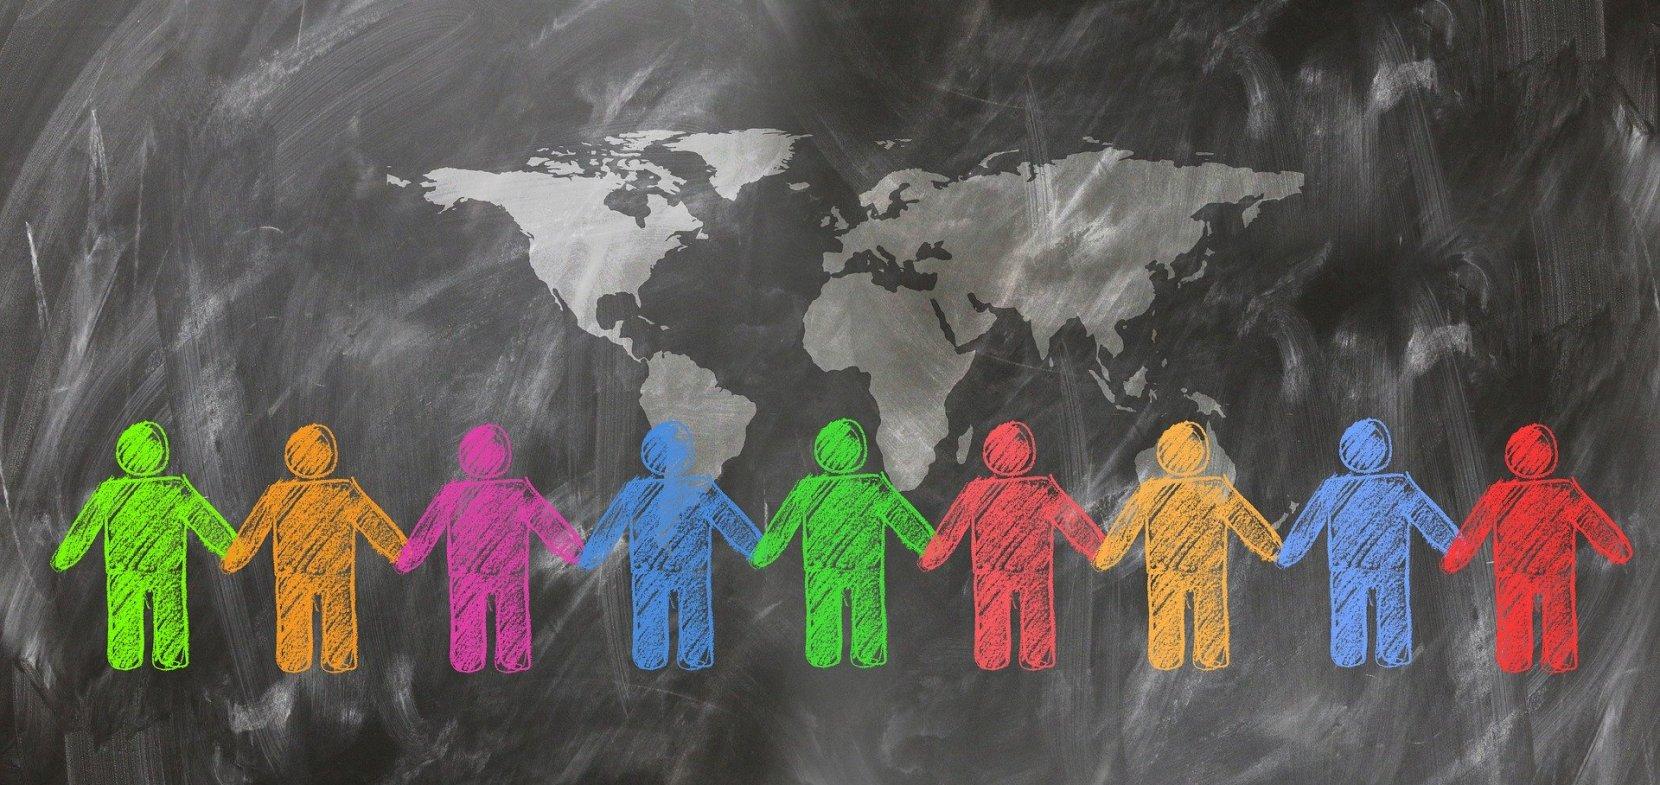 Globalisierung geht gerechter